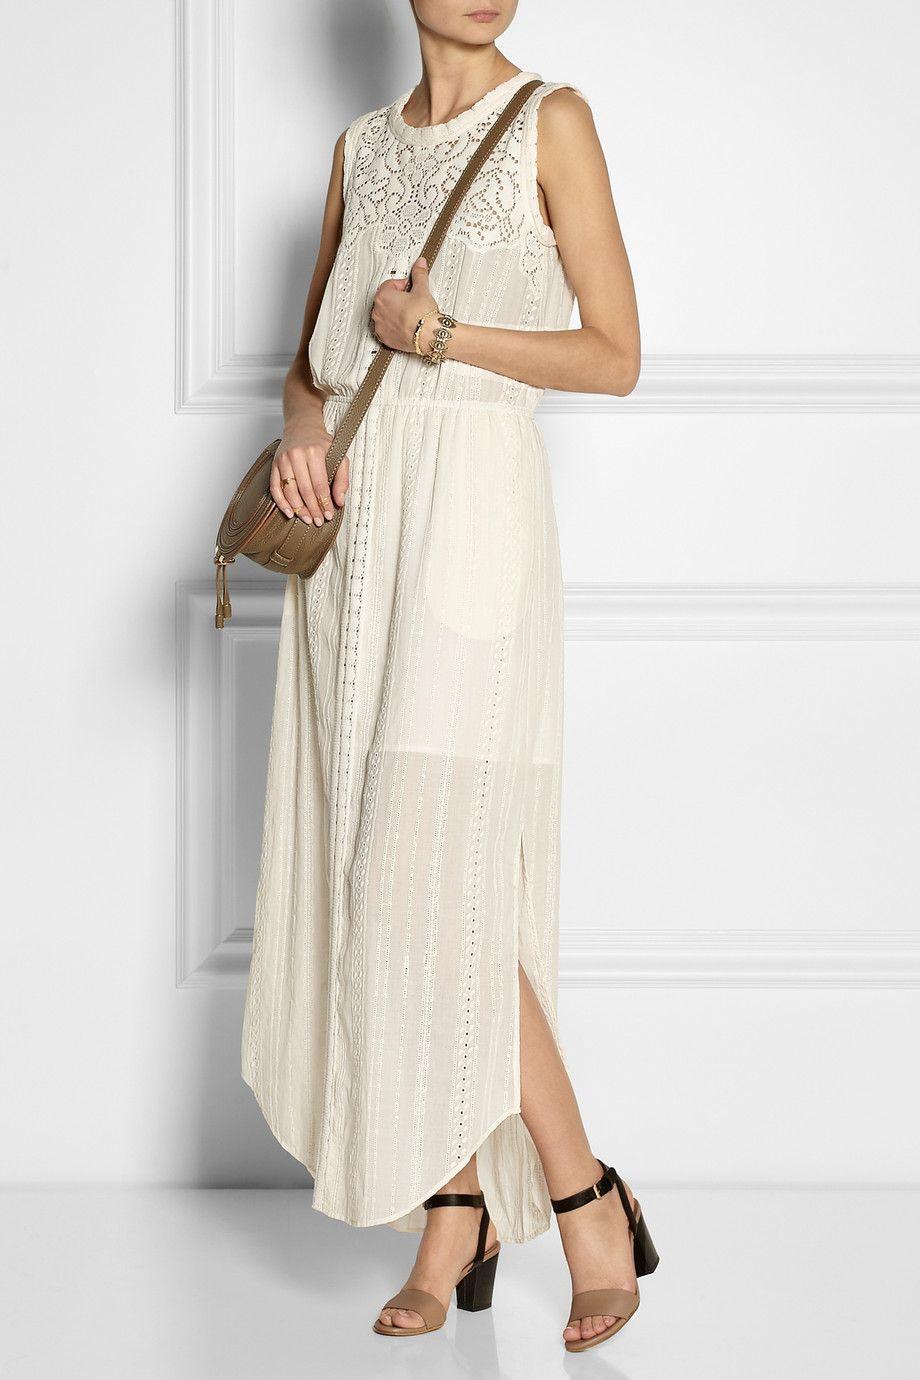 Wedding dresses for short women  SEA  Lacepaneled broderie anglaise cotton maxi dress  NETA